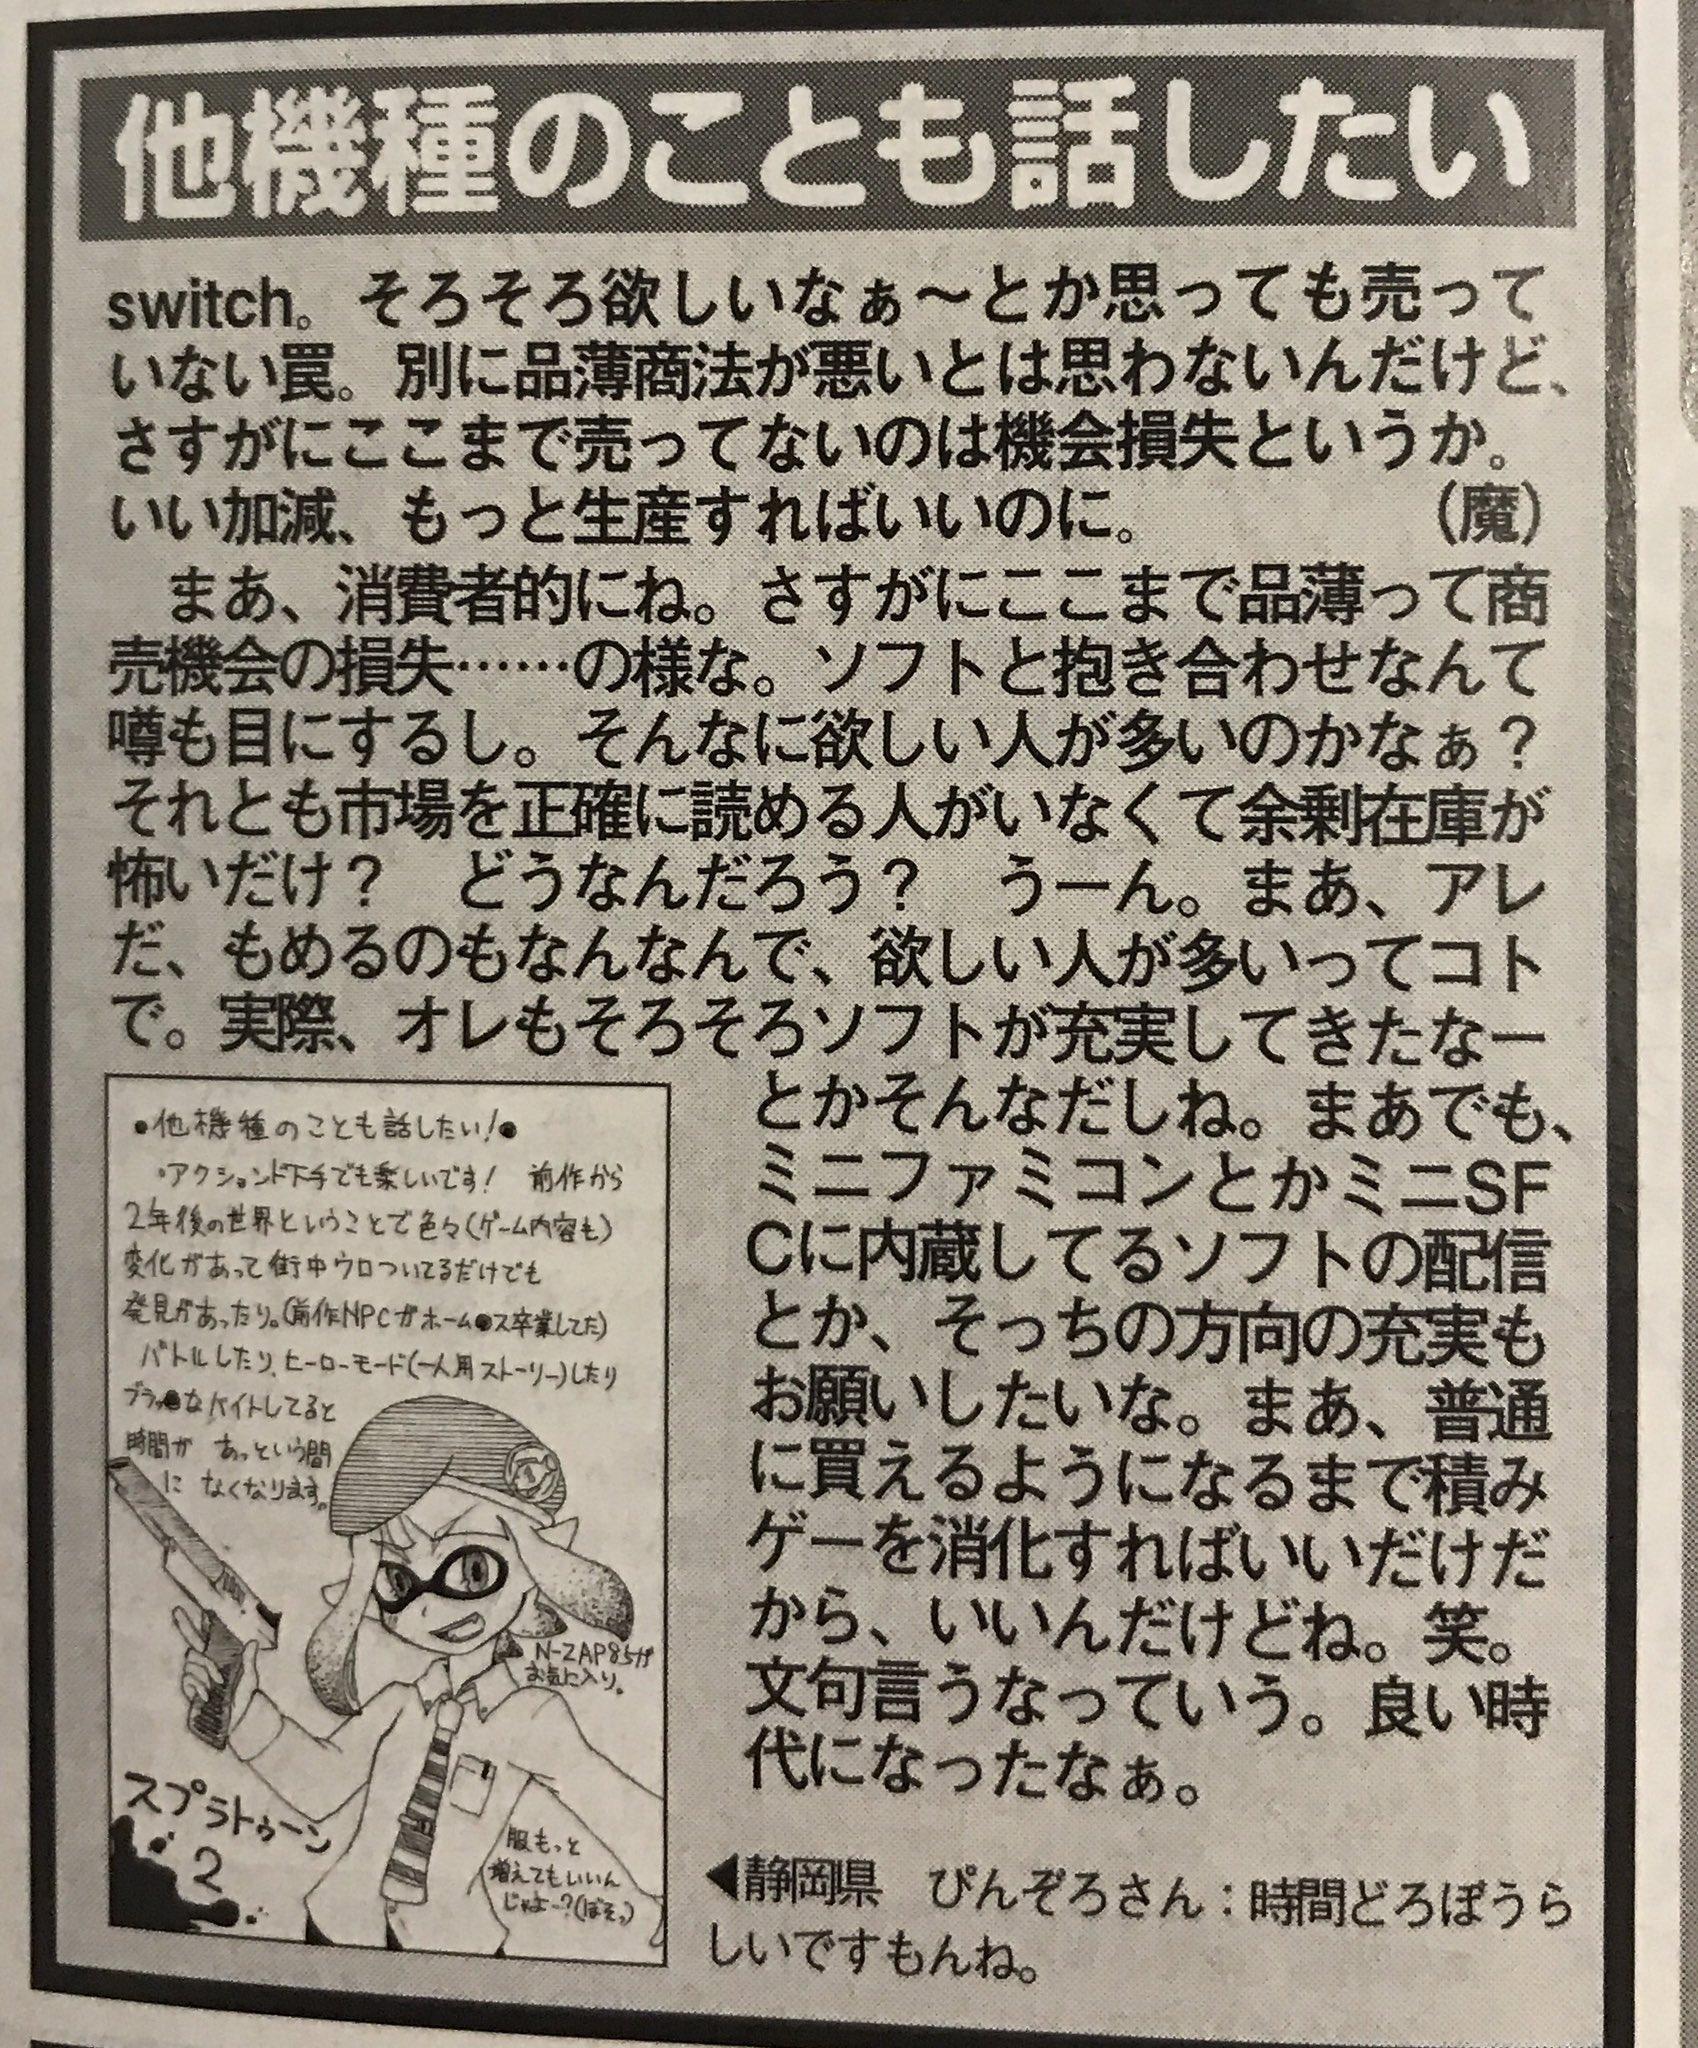 y3NNXicvdOrRe - 電撃PlayStation「任天堂は品薄商法と抱き合わせ商法を今すぐやめろ!!!」